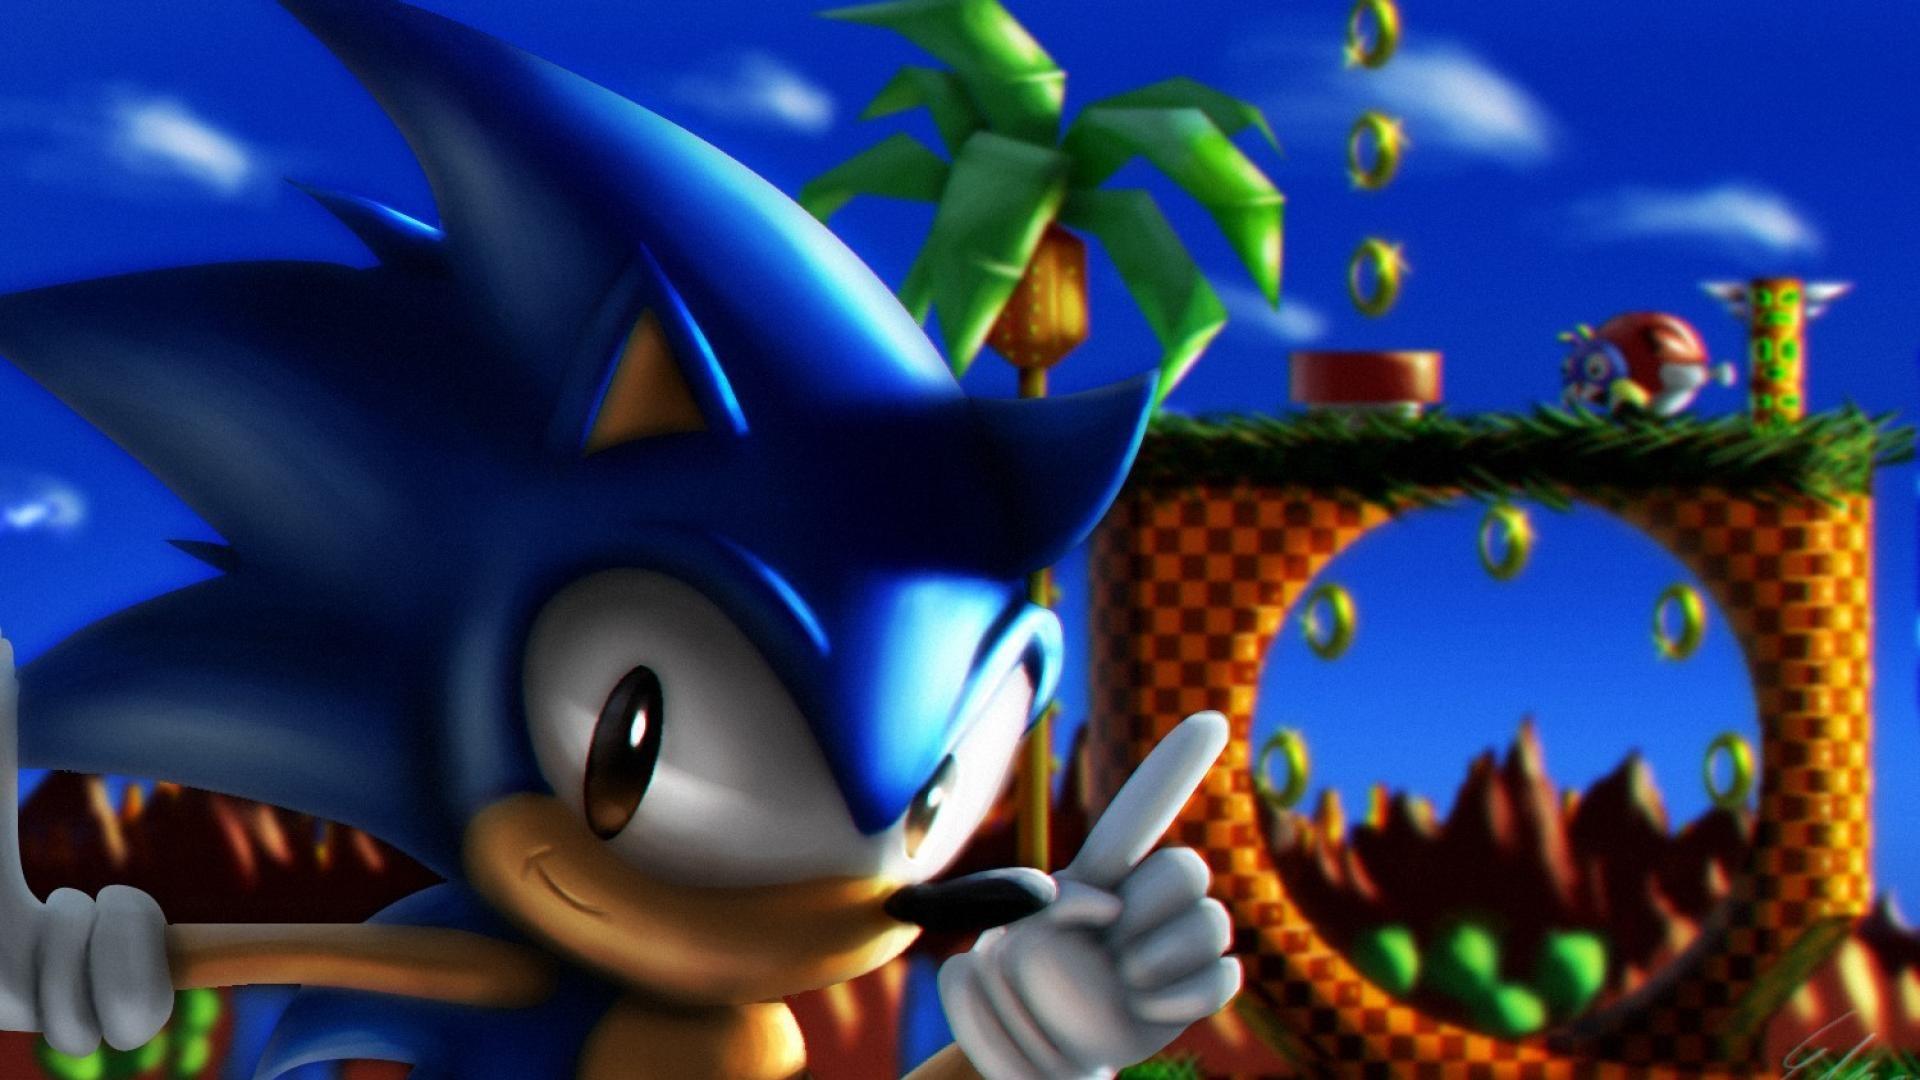 The hedgehog video games sega entertainment default wallpaper .